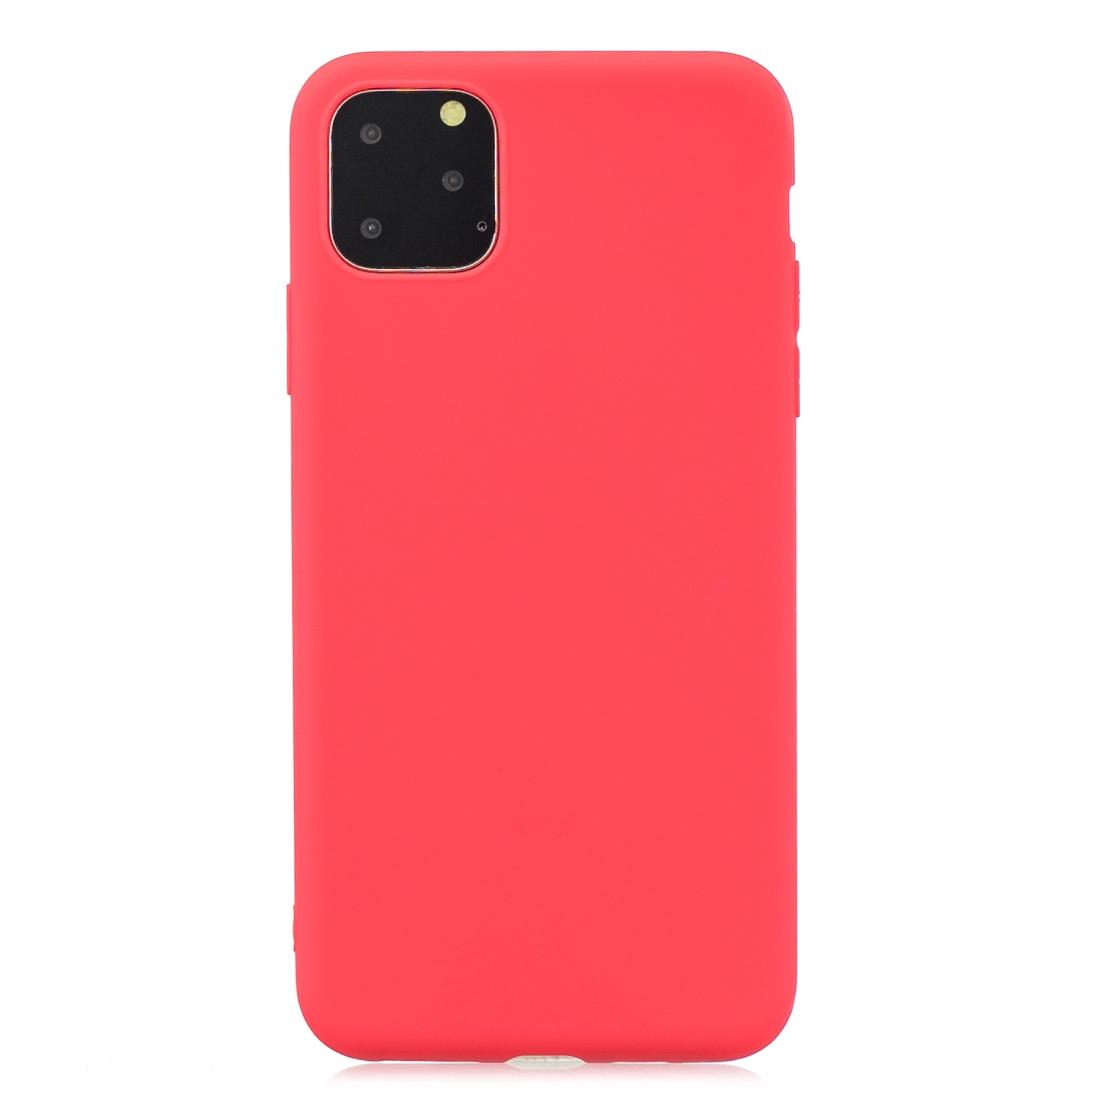 Matný silikonový obal na iPhone 11 Pro Max - červená